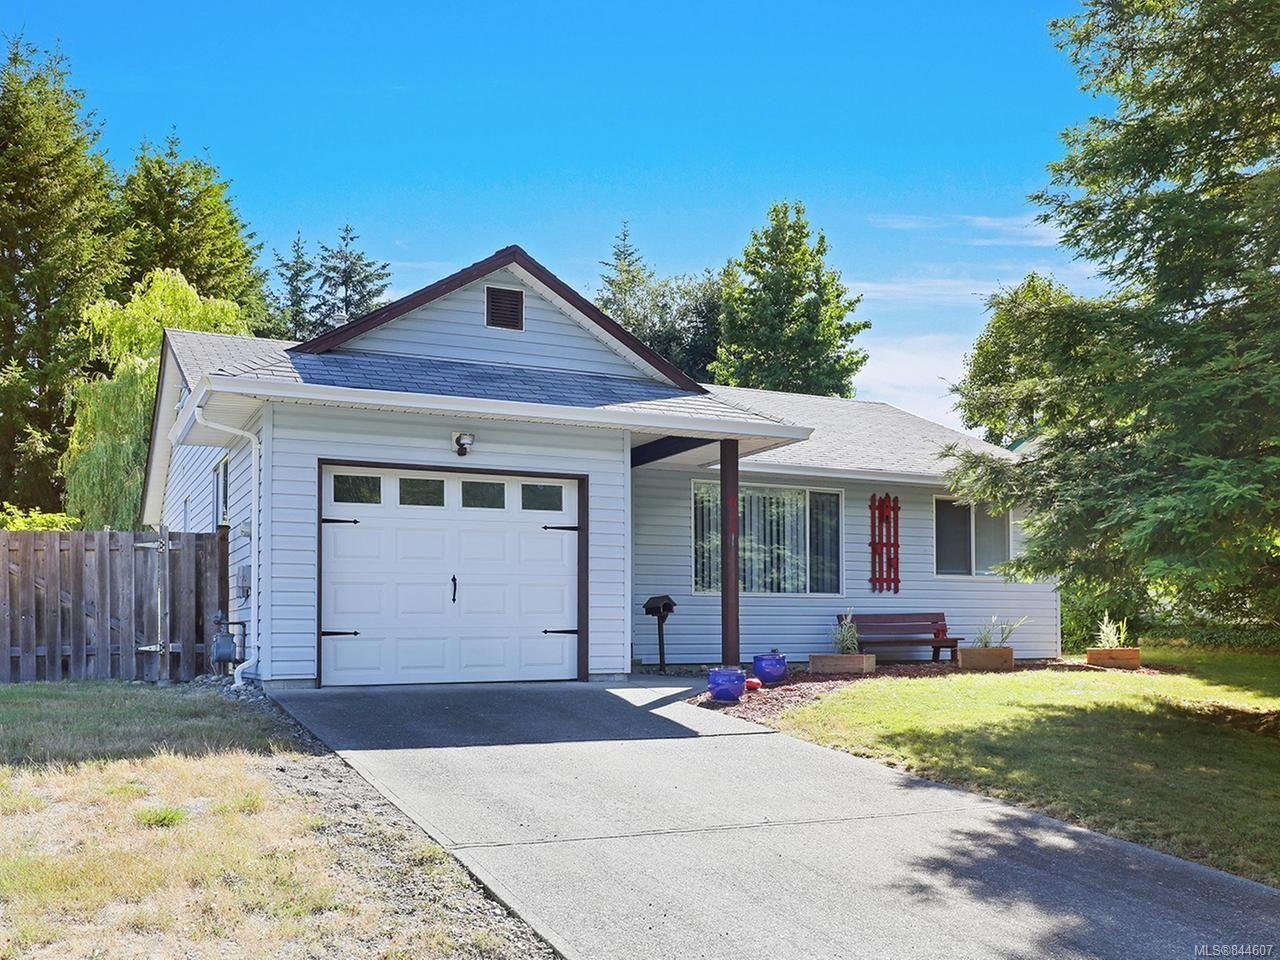 Main Photo: 611 S McPhedran Rd in CAMPBELL RIVER: CR Campbell River Central House for sale (Campbell River)  : MLS®# 844607